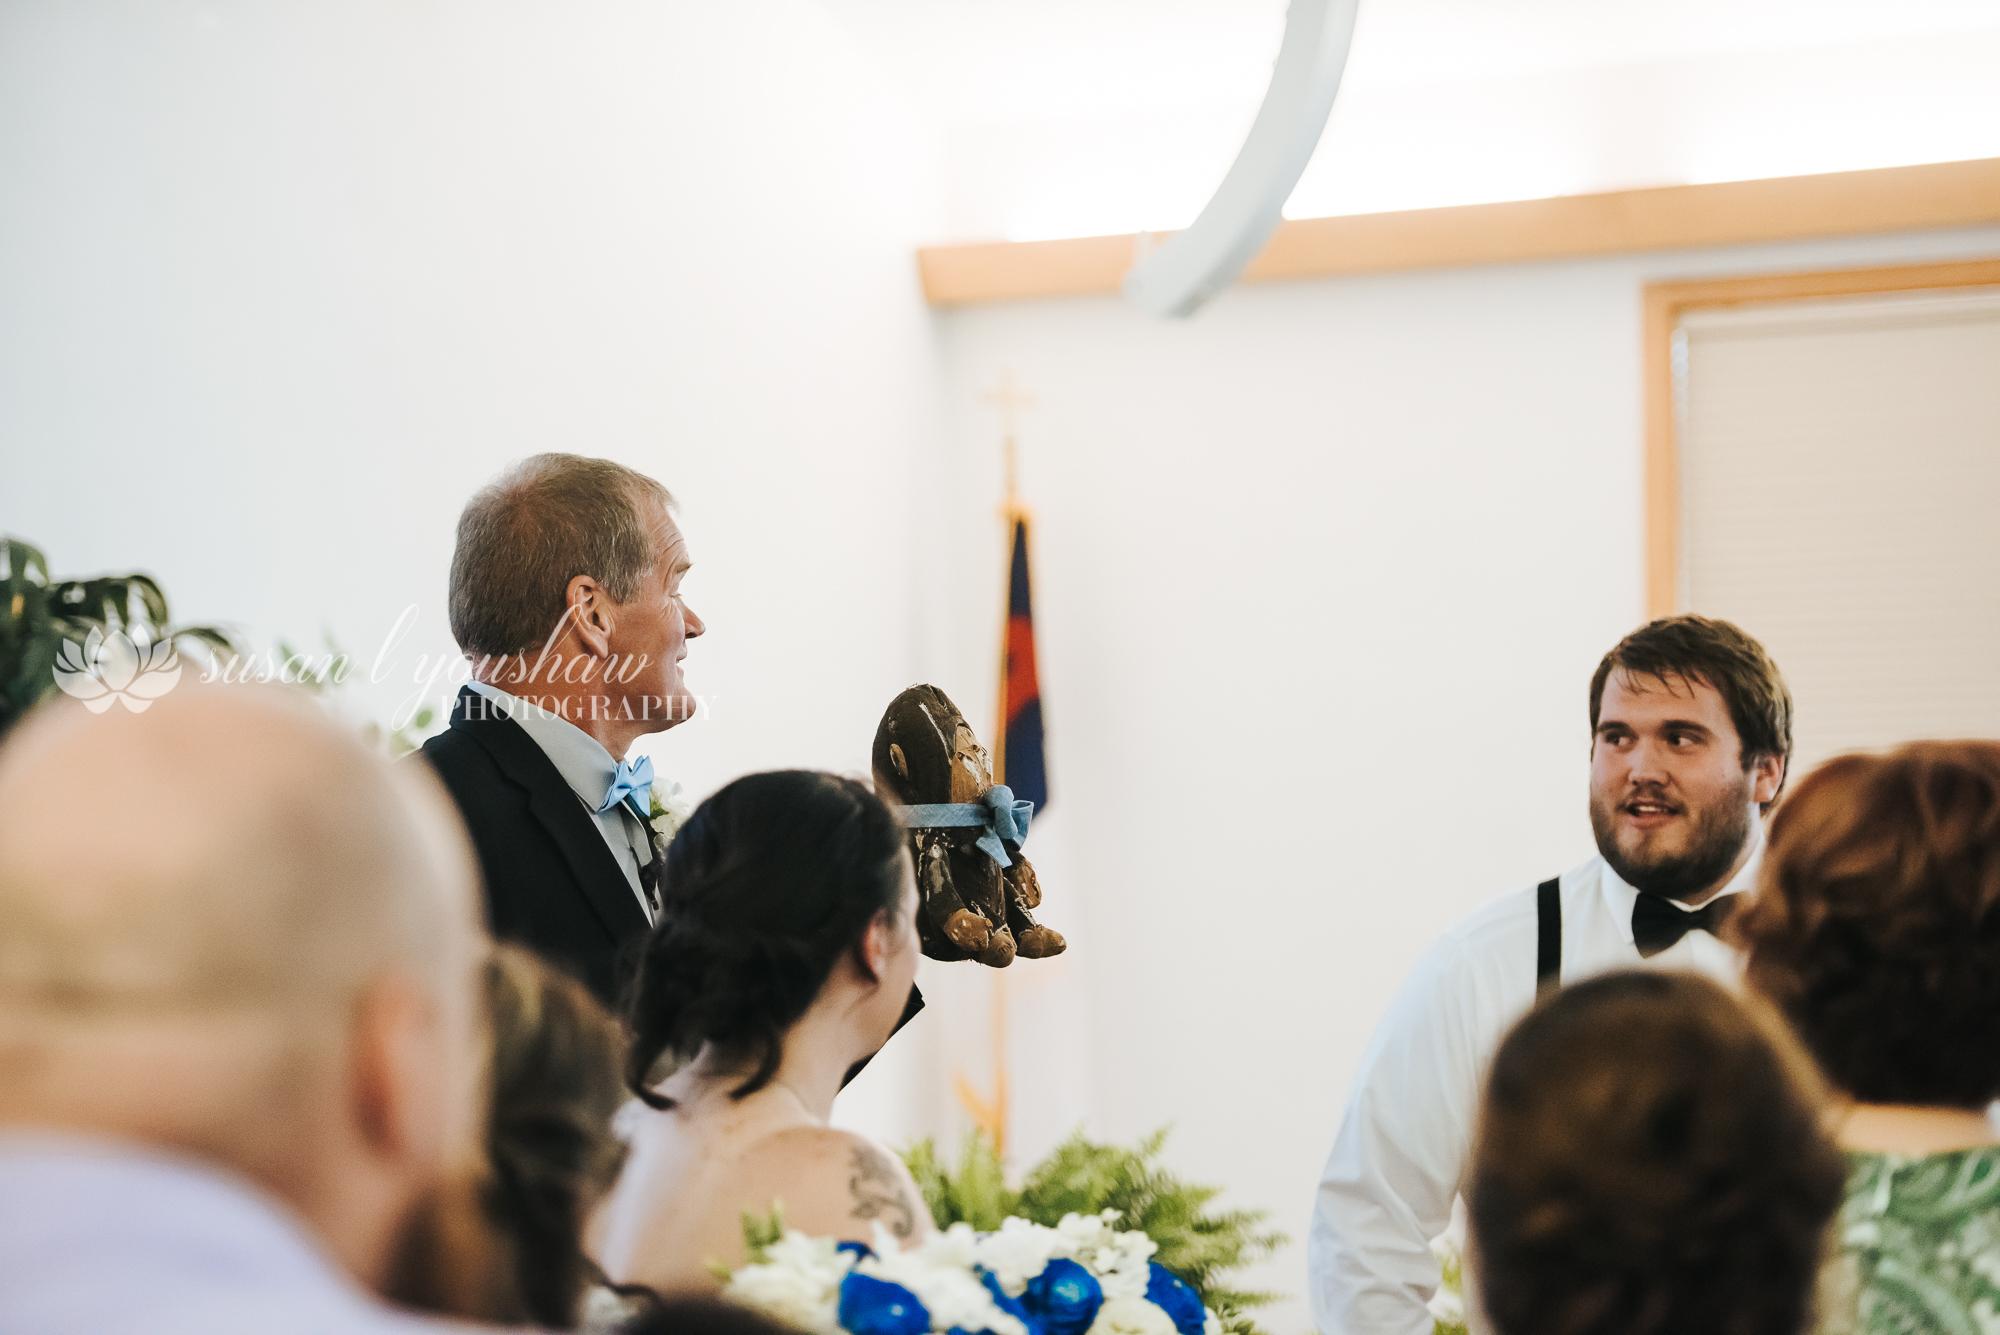 Katelyn and Wes Wedding Photos 07-13-2019 SLY Photography-61.jpg